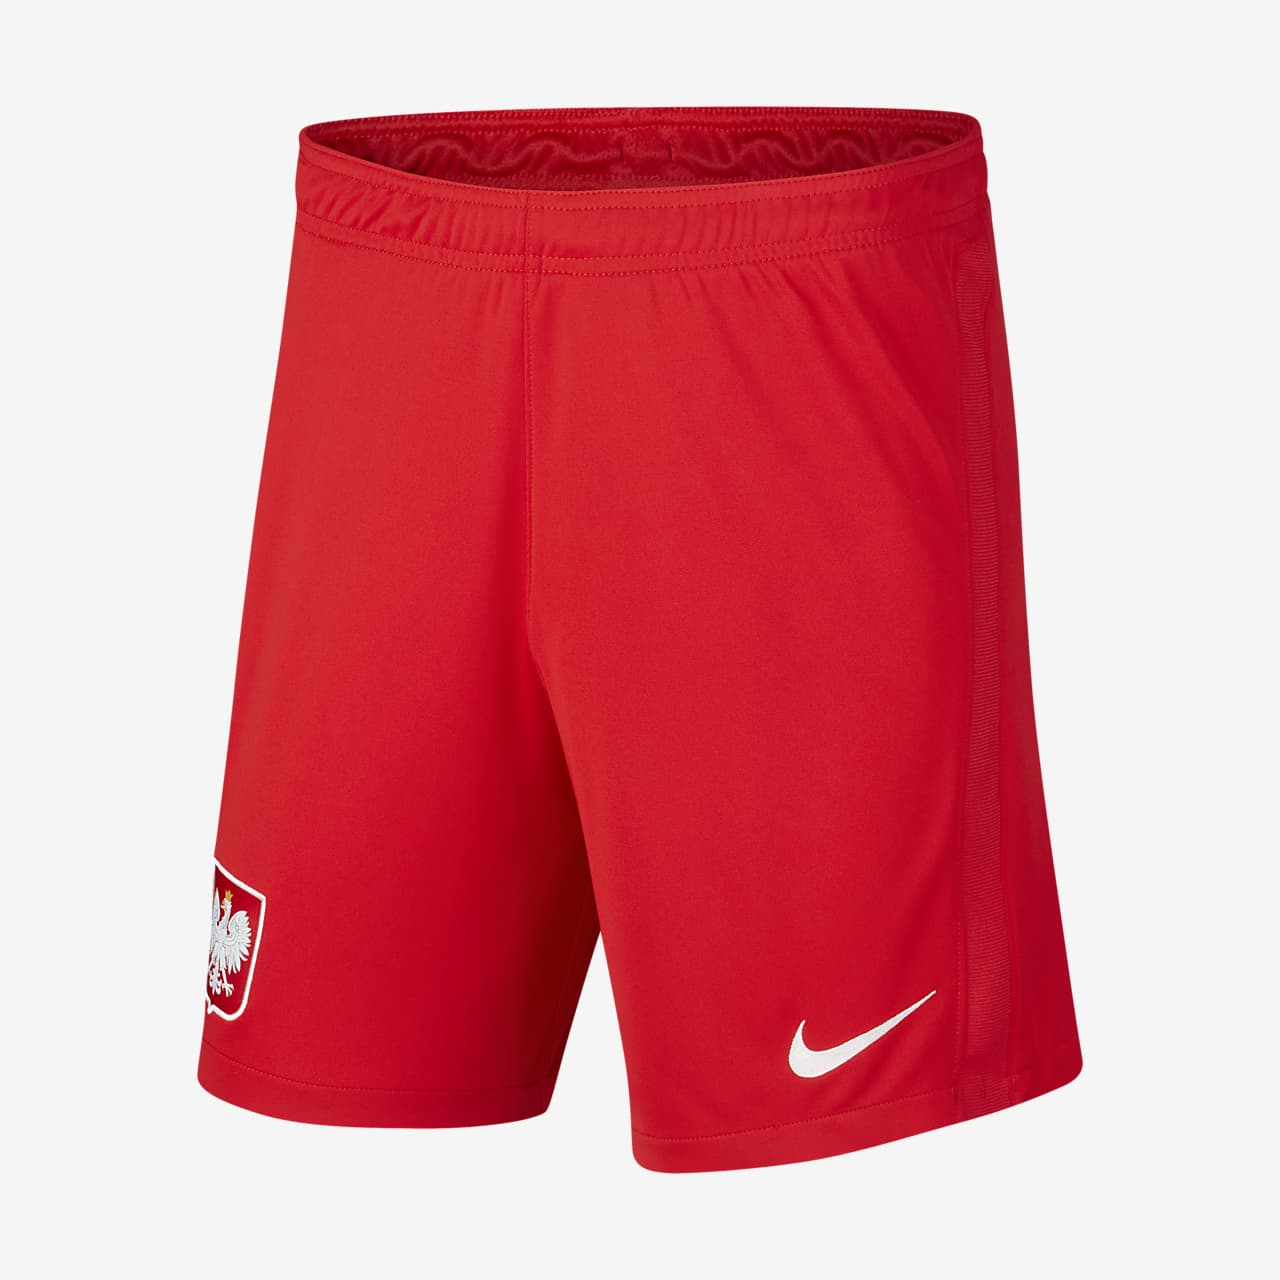 Poland 2020 Stadium Home/Away Men's Football Shorts